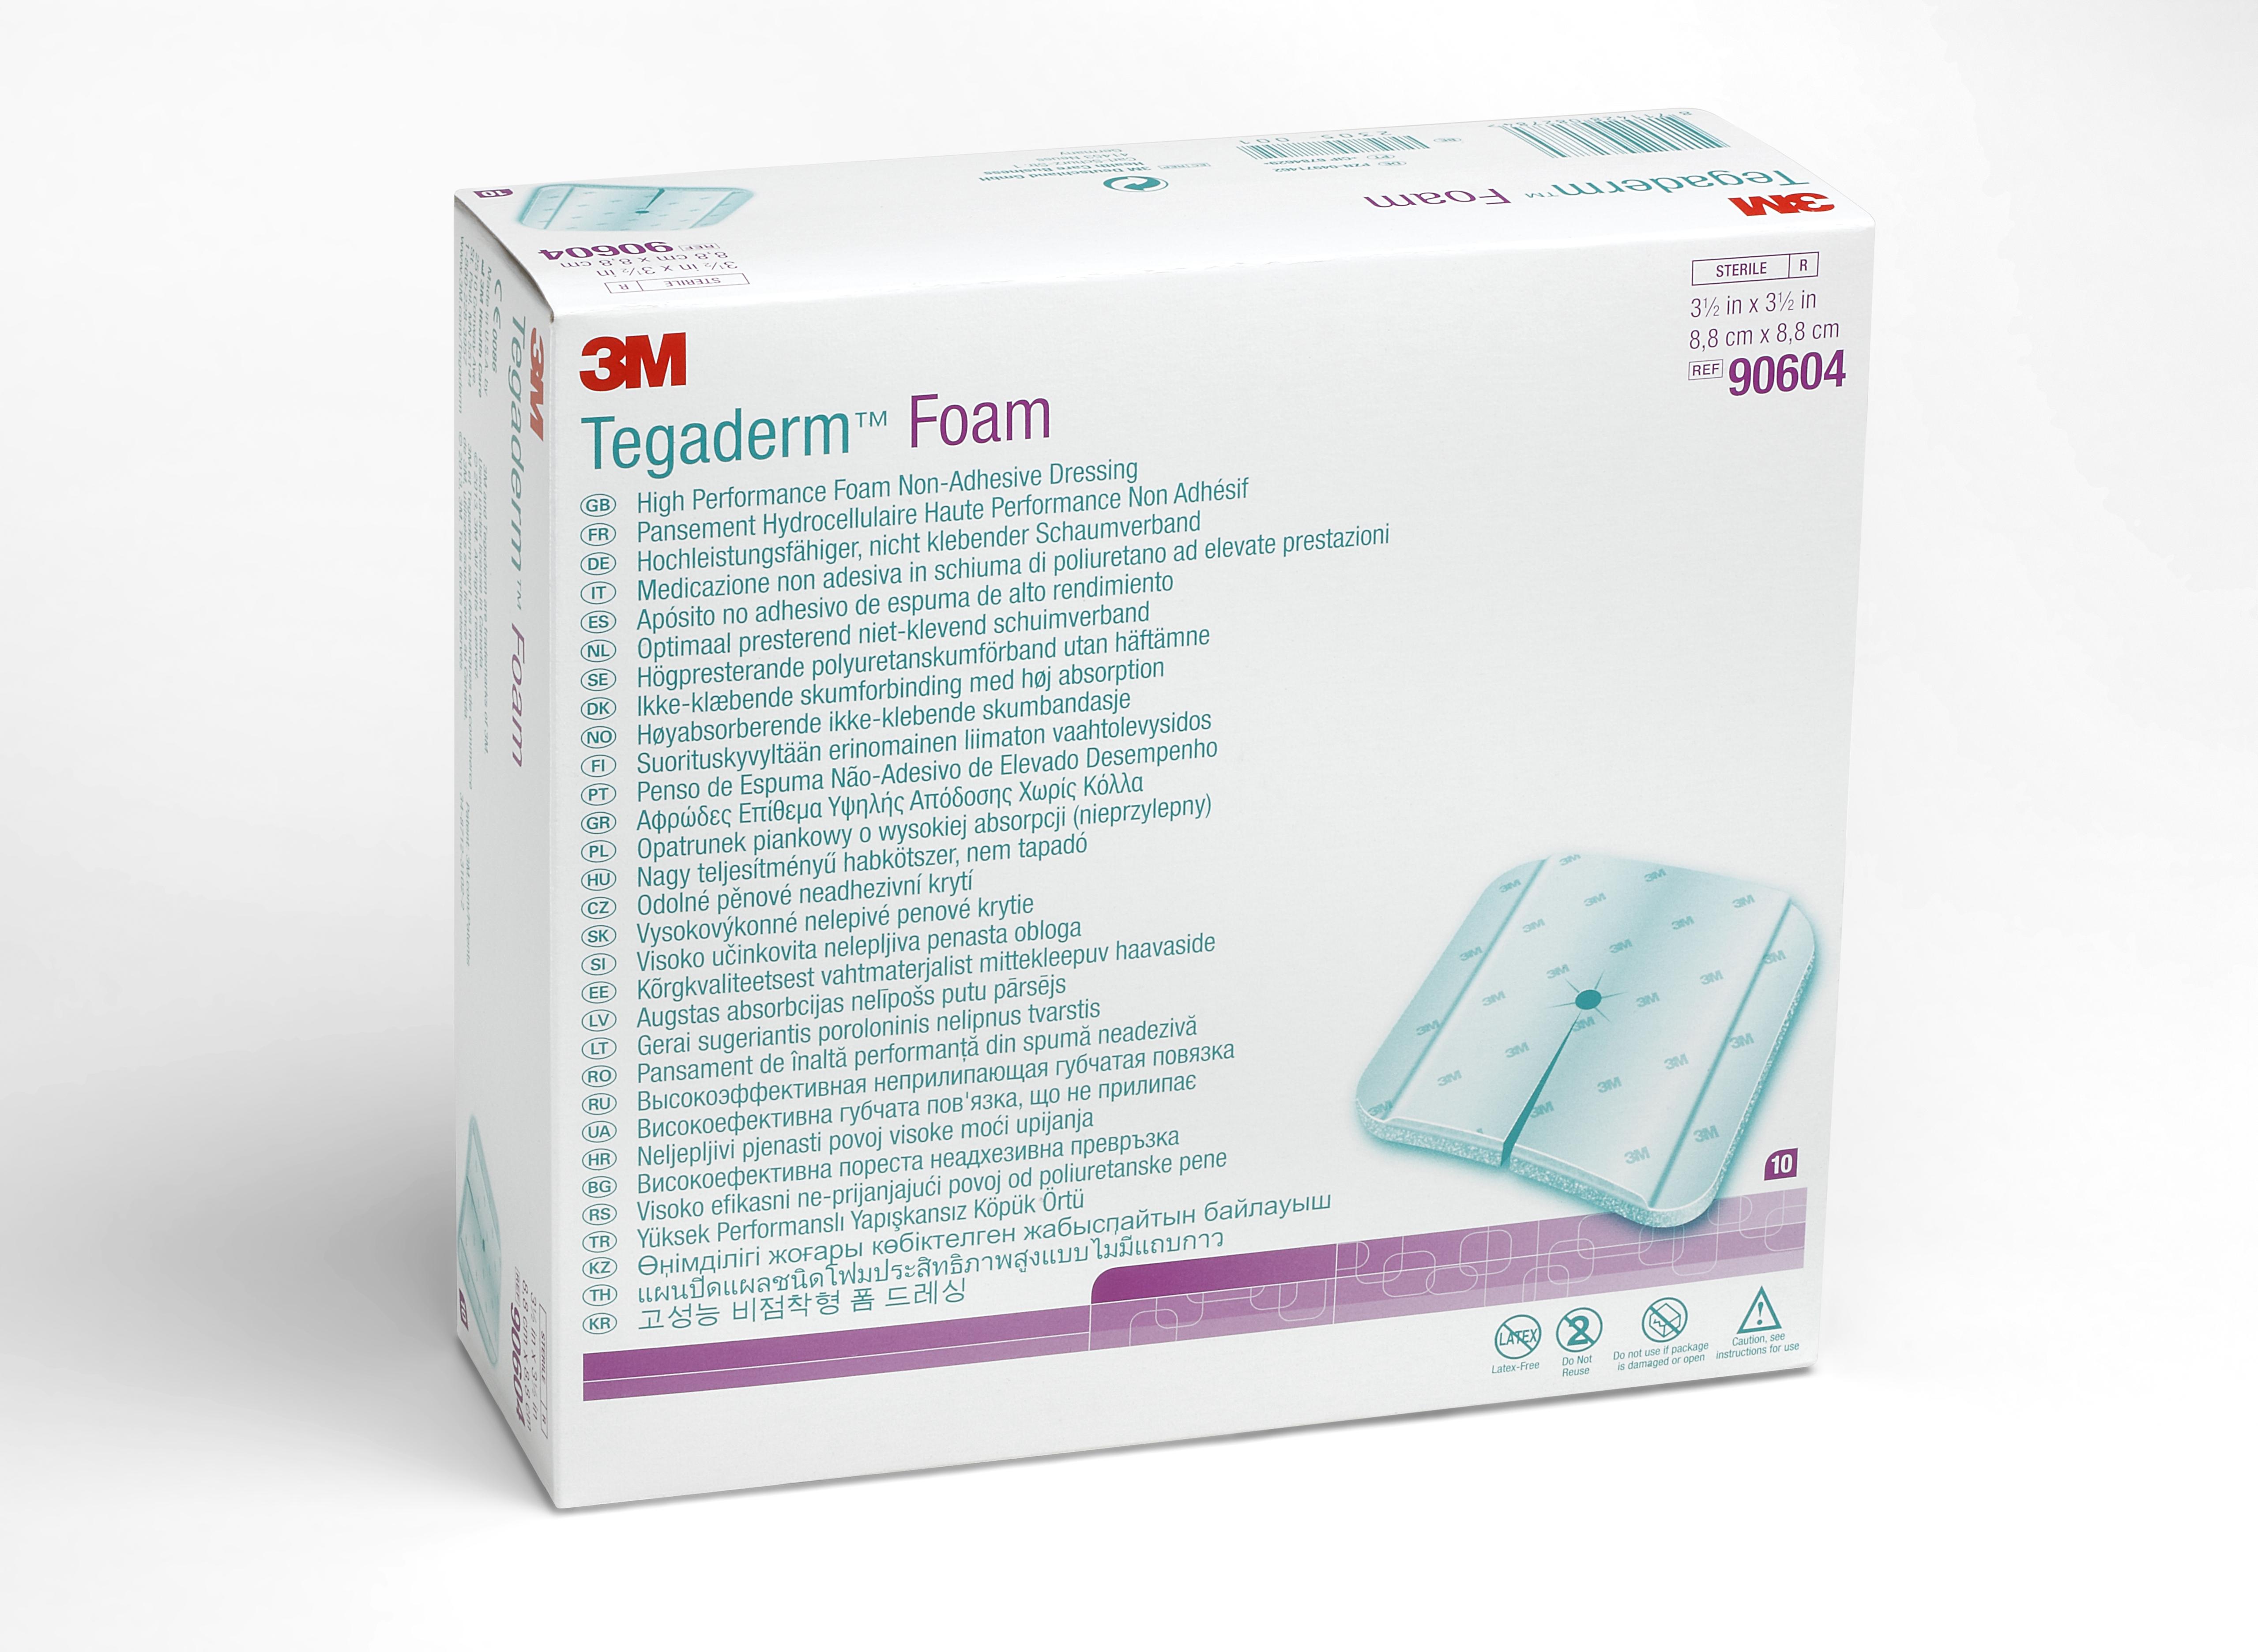 "3M Tegaderm Foam High Performance Foam Non-Adhesive Dressing, 3.5 X 3.5"", 90604, Box of 10"